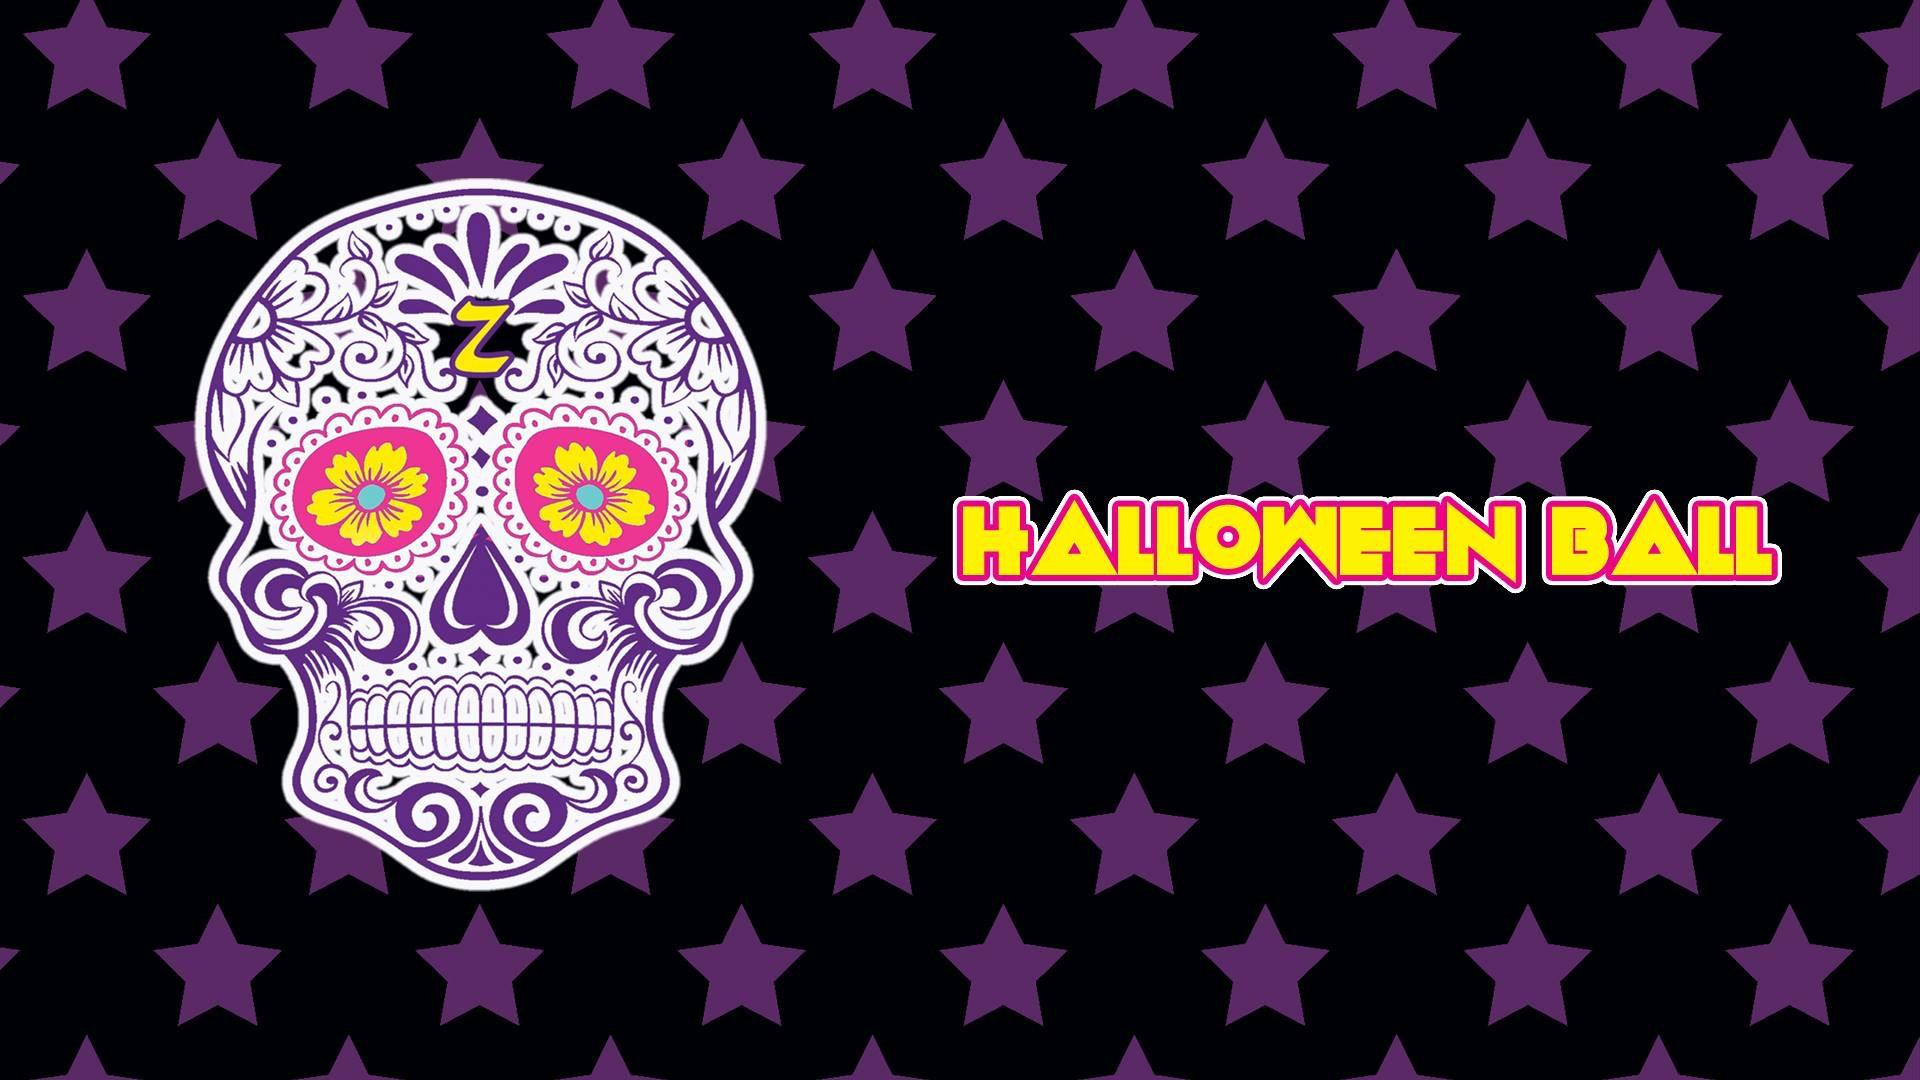 Planet Zogg Halloween Ball